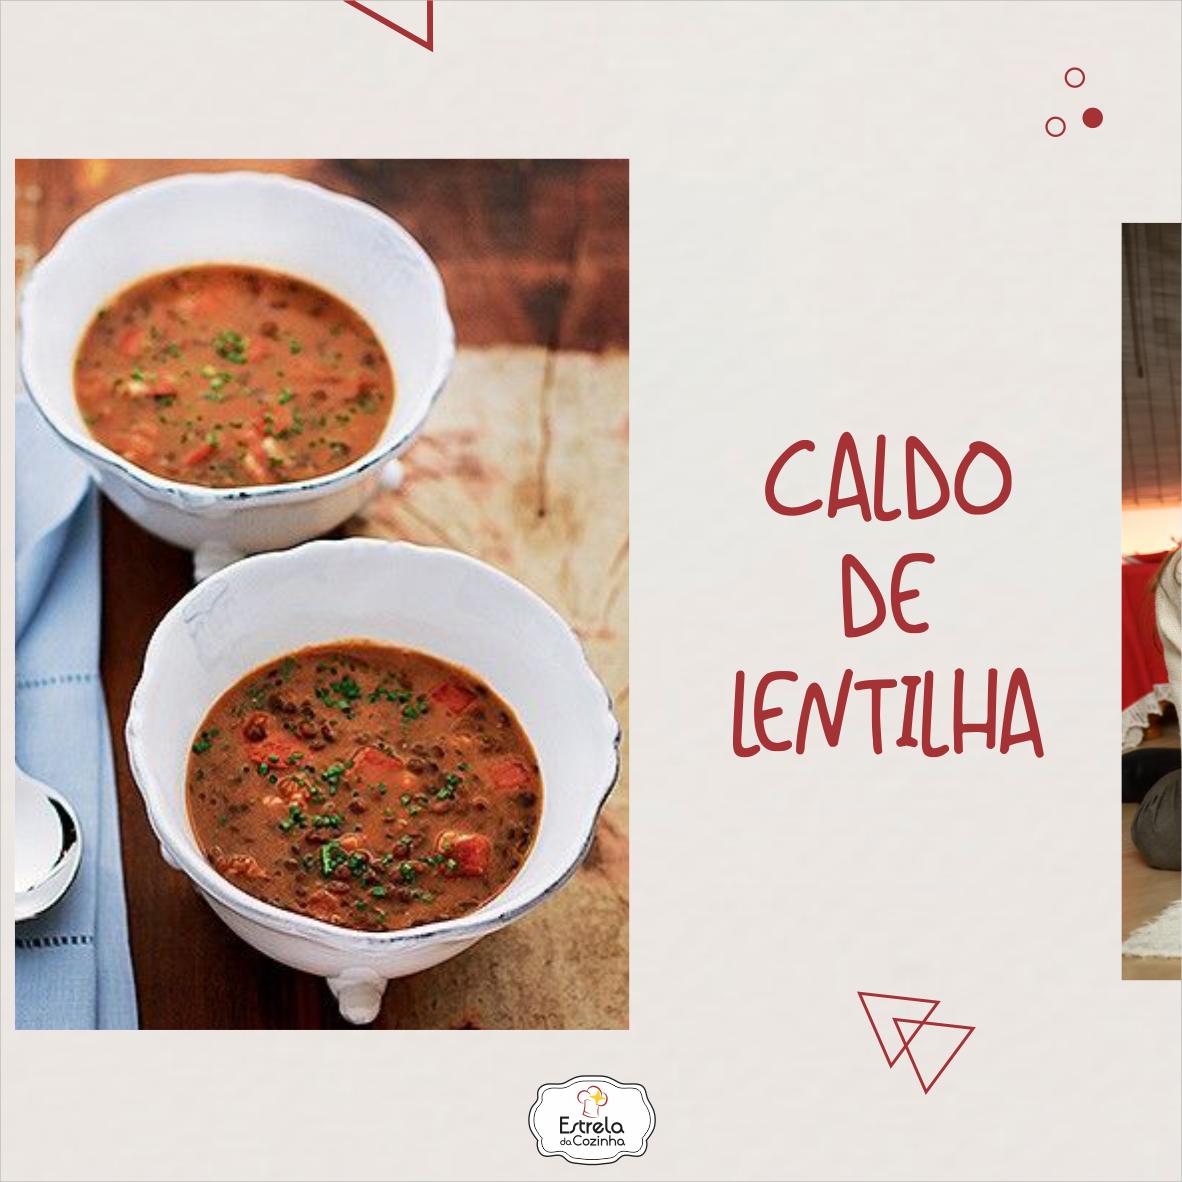 You are currently viewing Caldo de lentilha